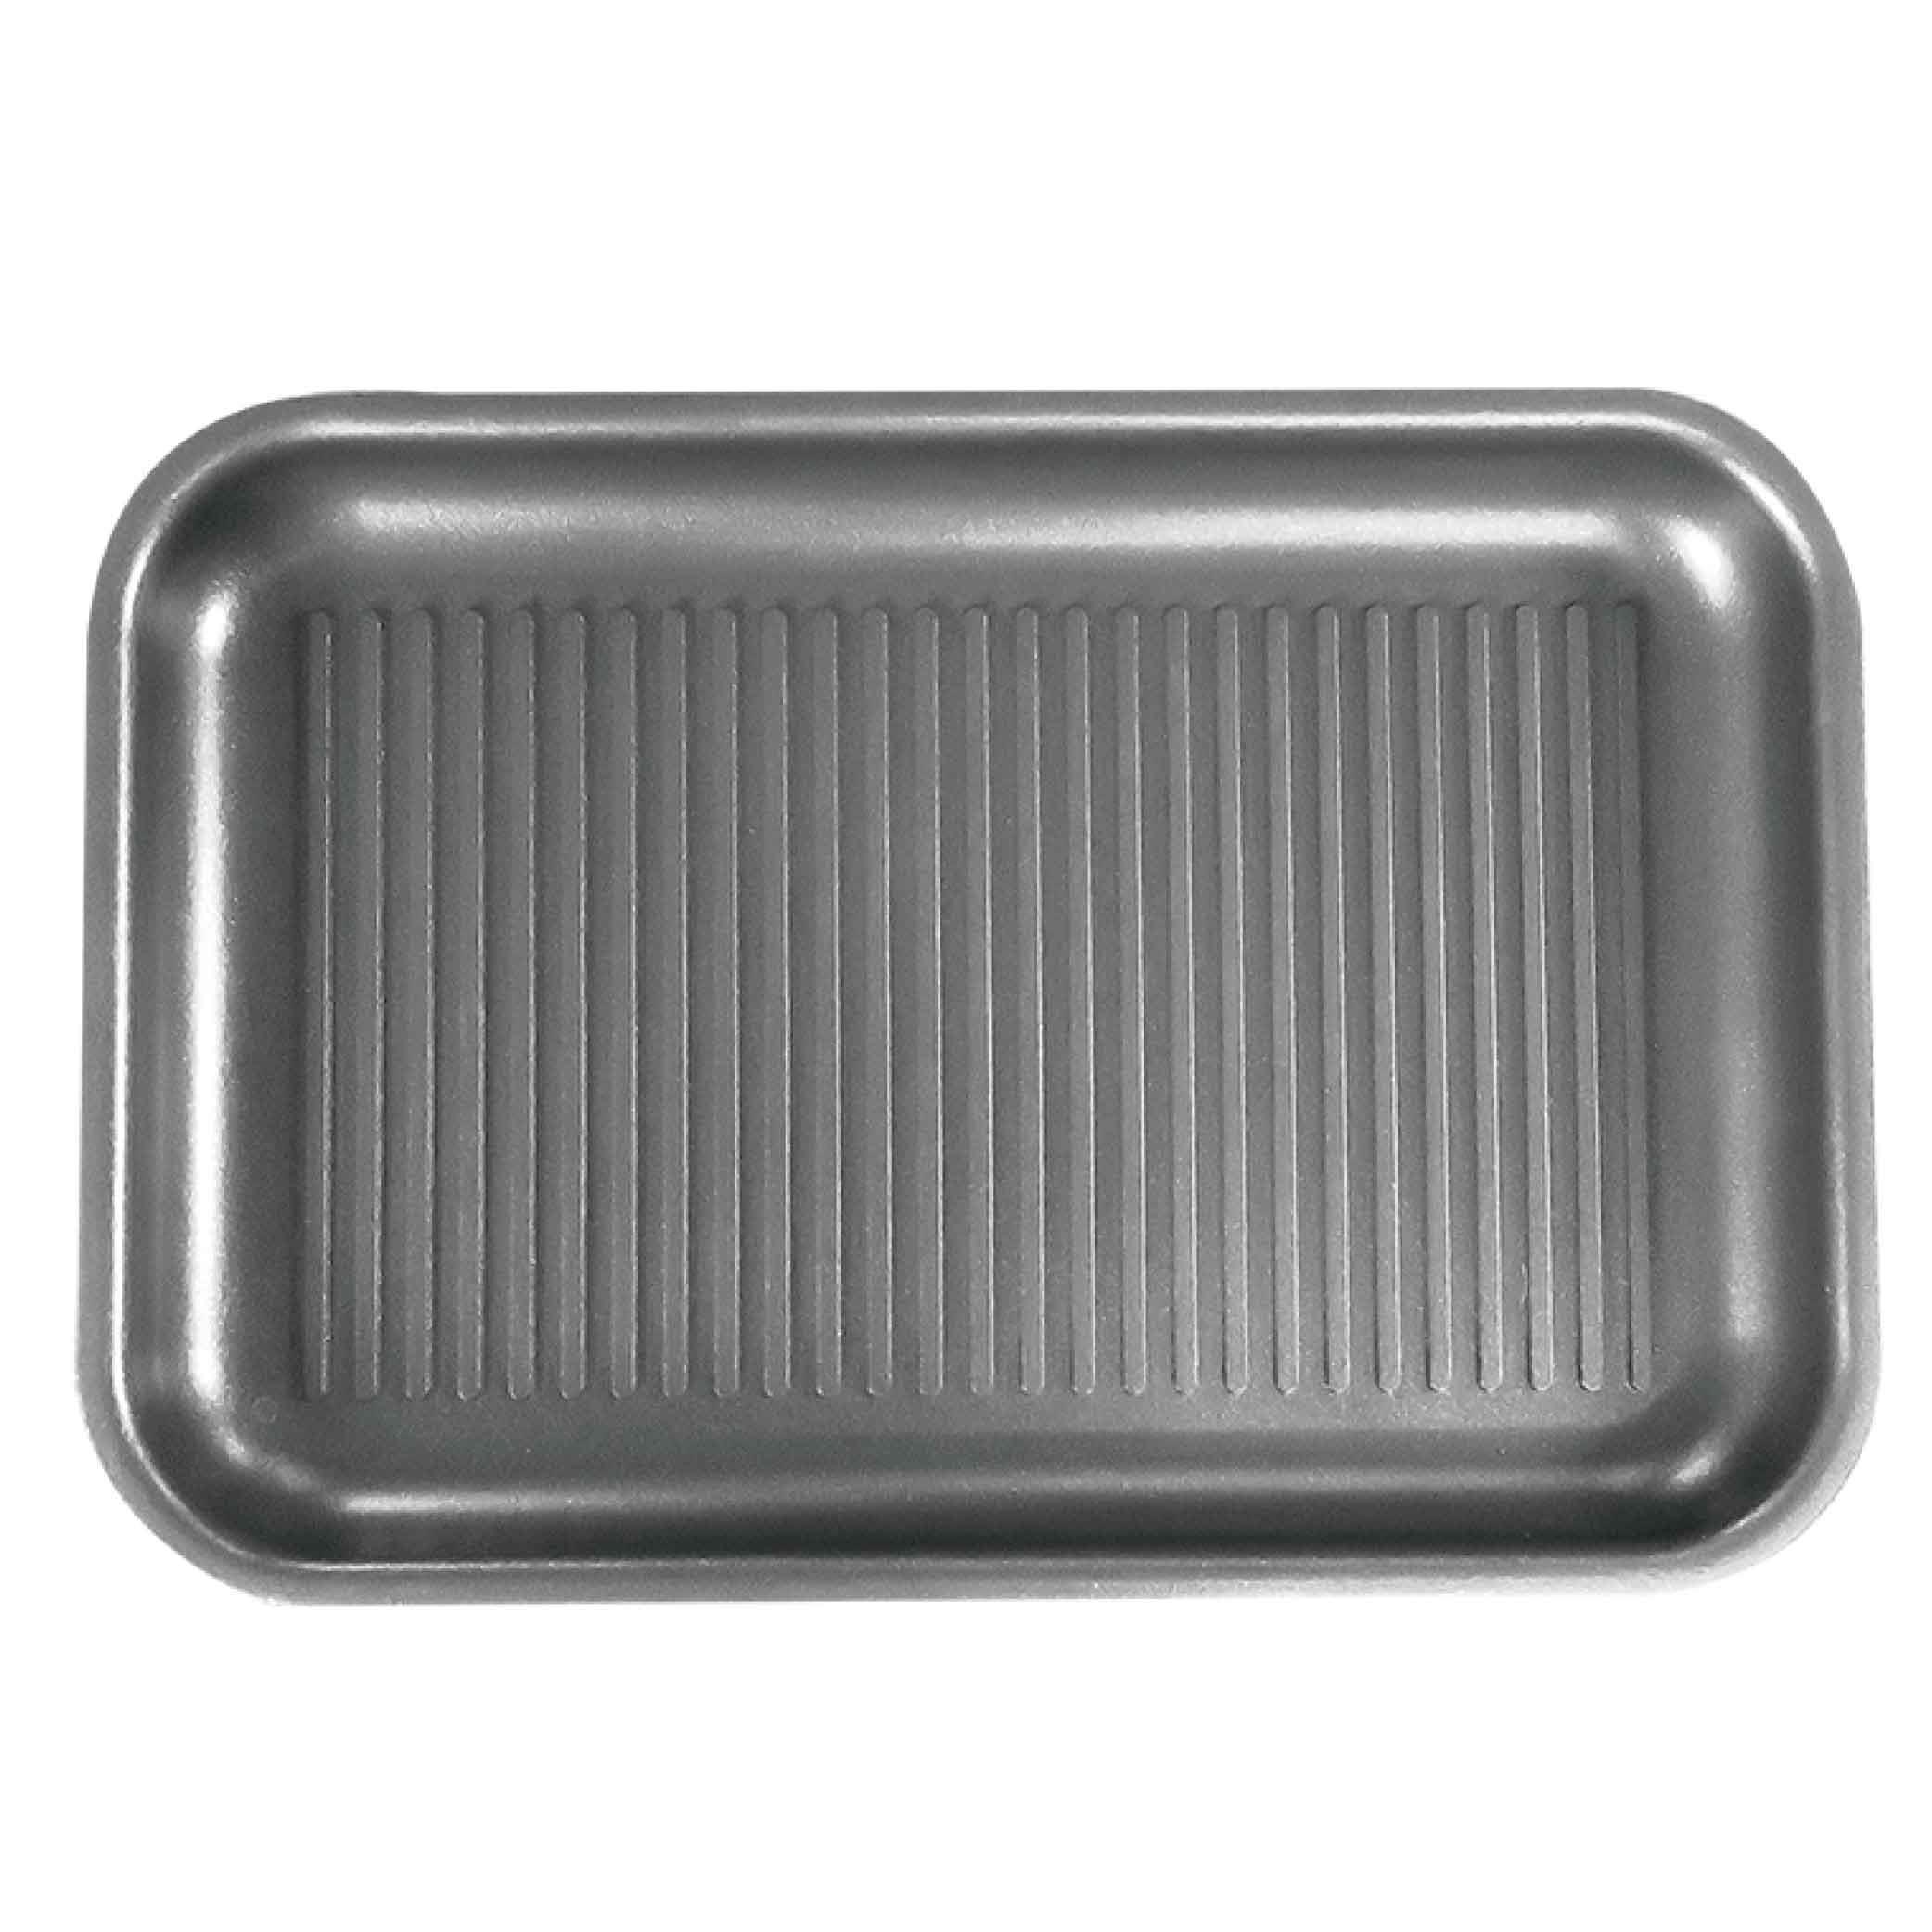 Tiffany蒂芬妮藍鑽石電烤盤 專用燒烤盤EH1701E(不含主機)